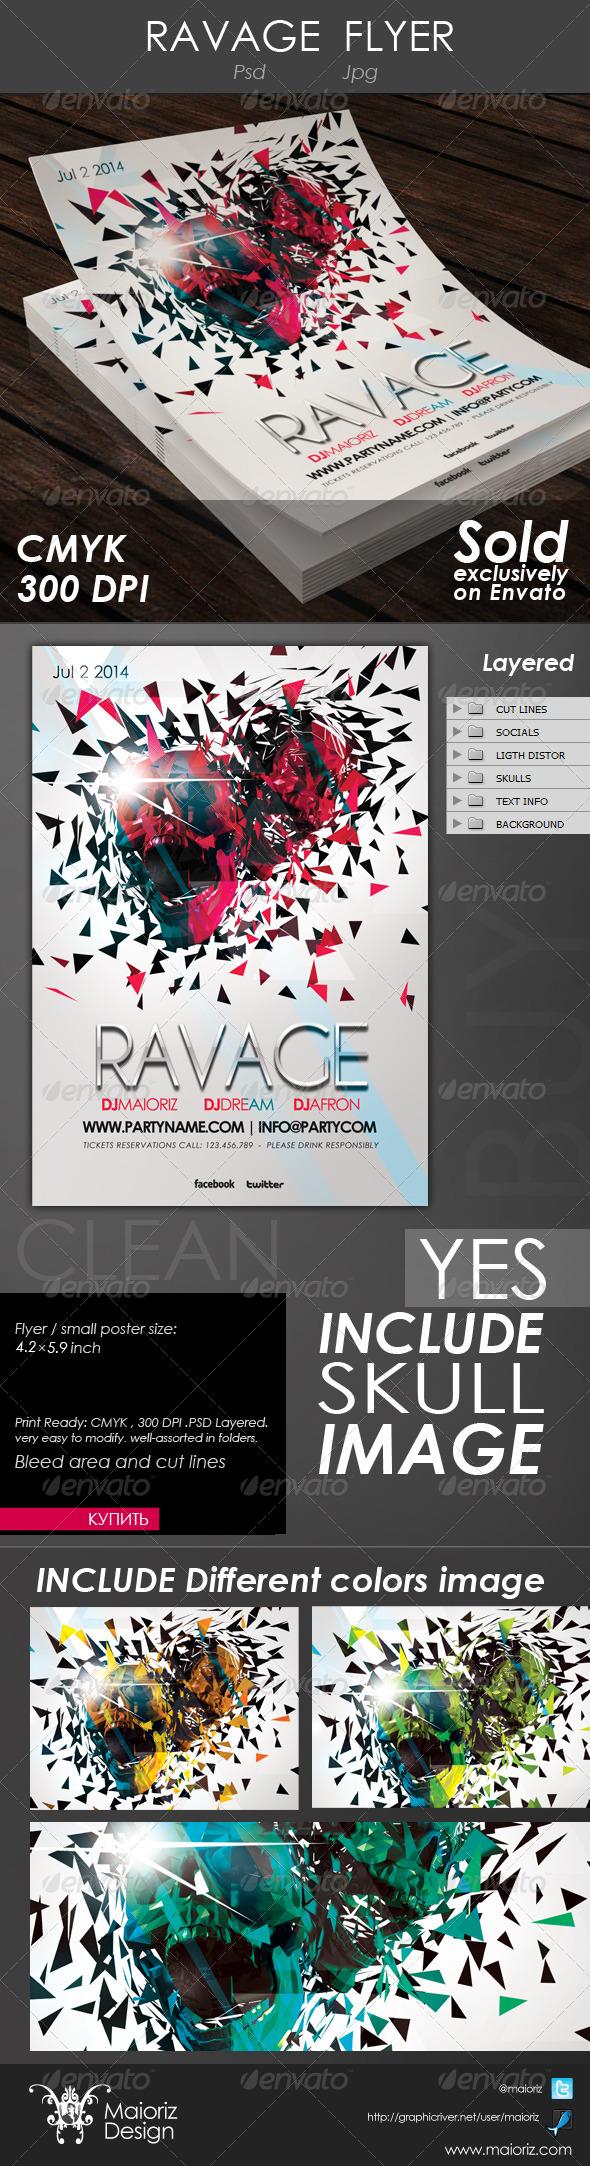 GraphicRiver Ravage Flyer 4294797